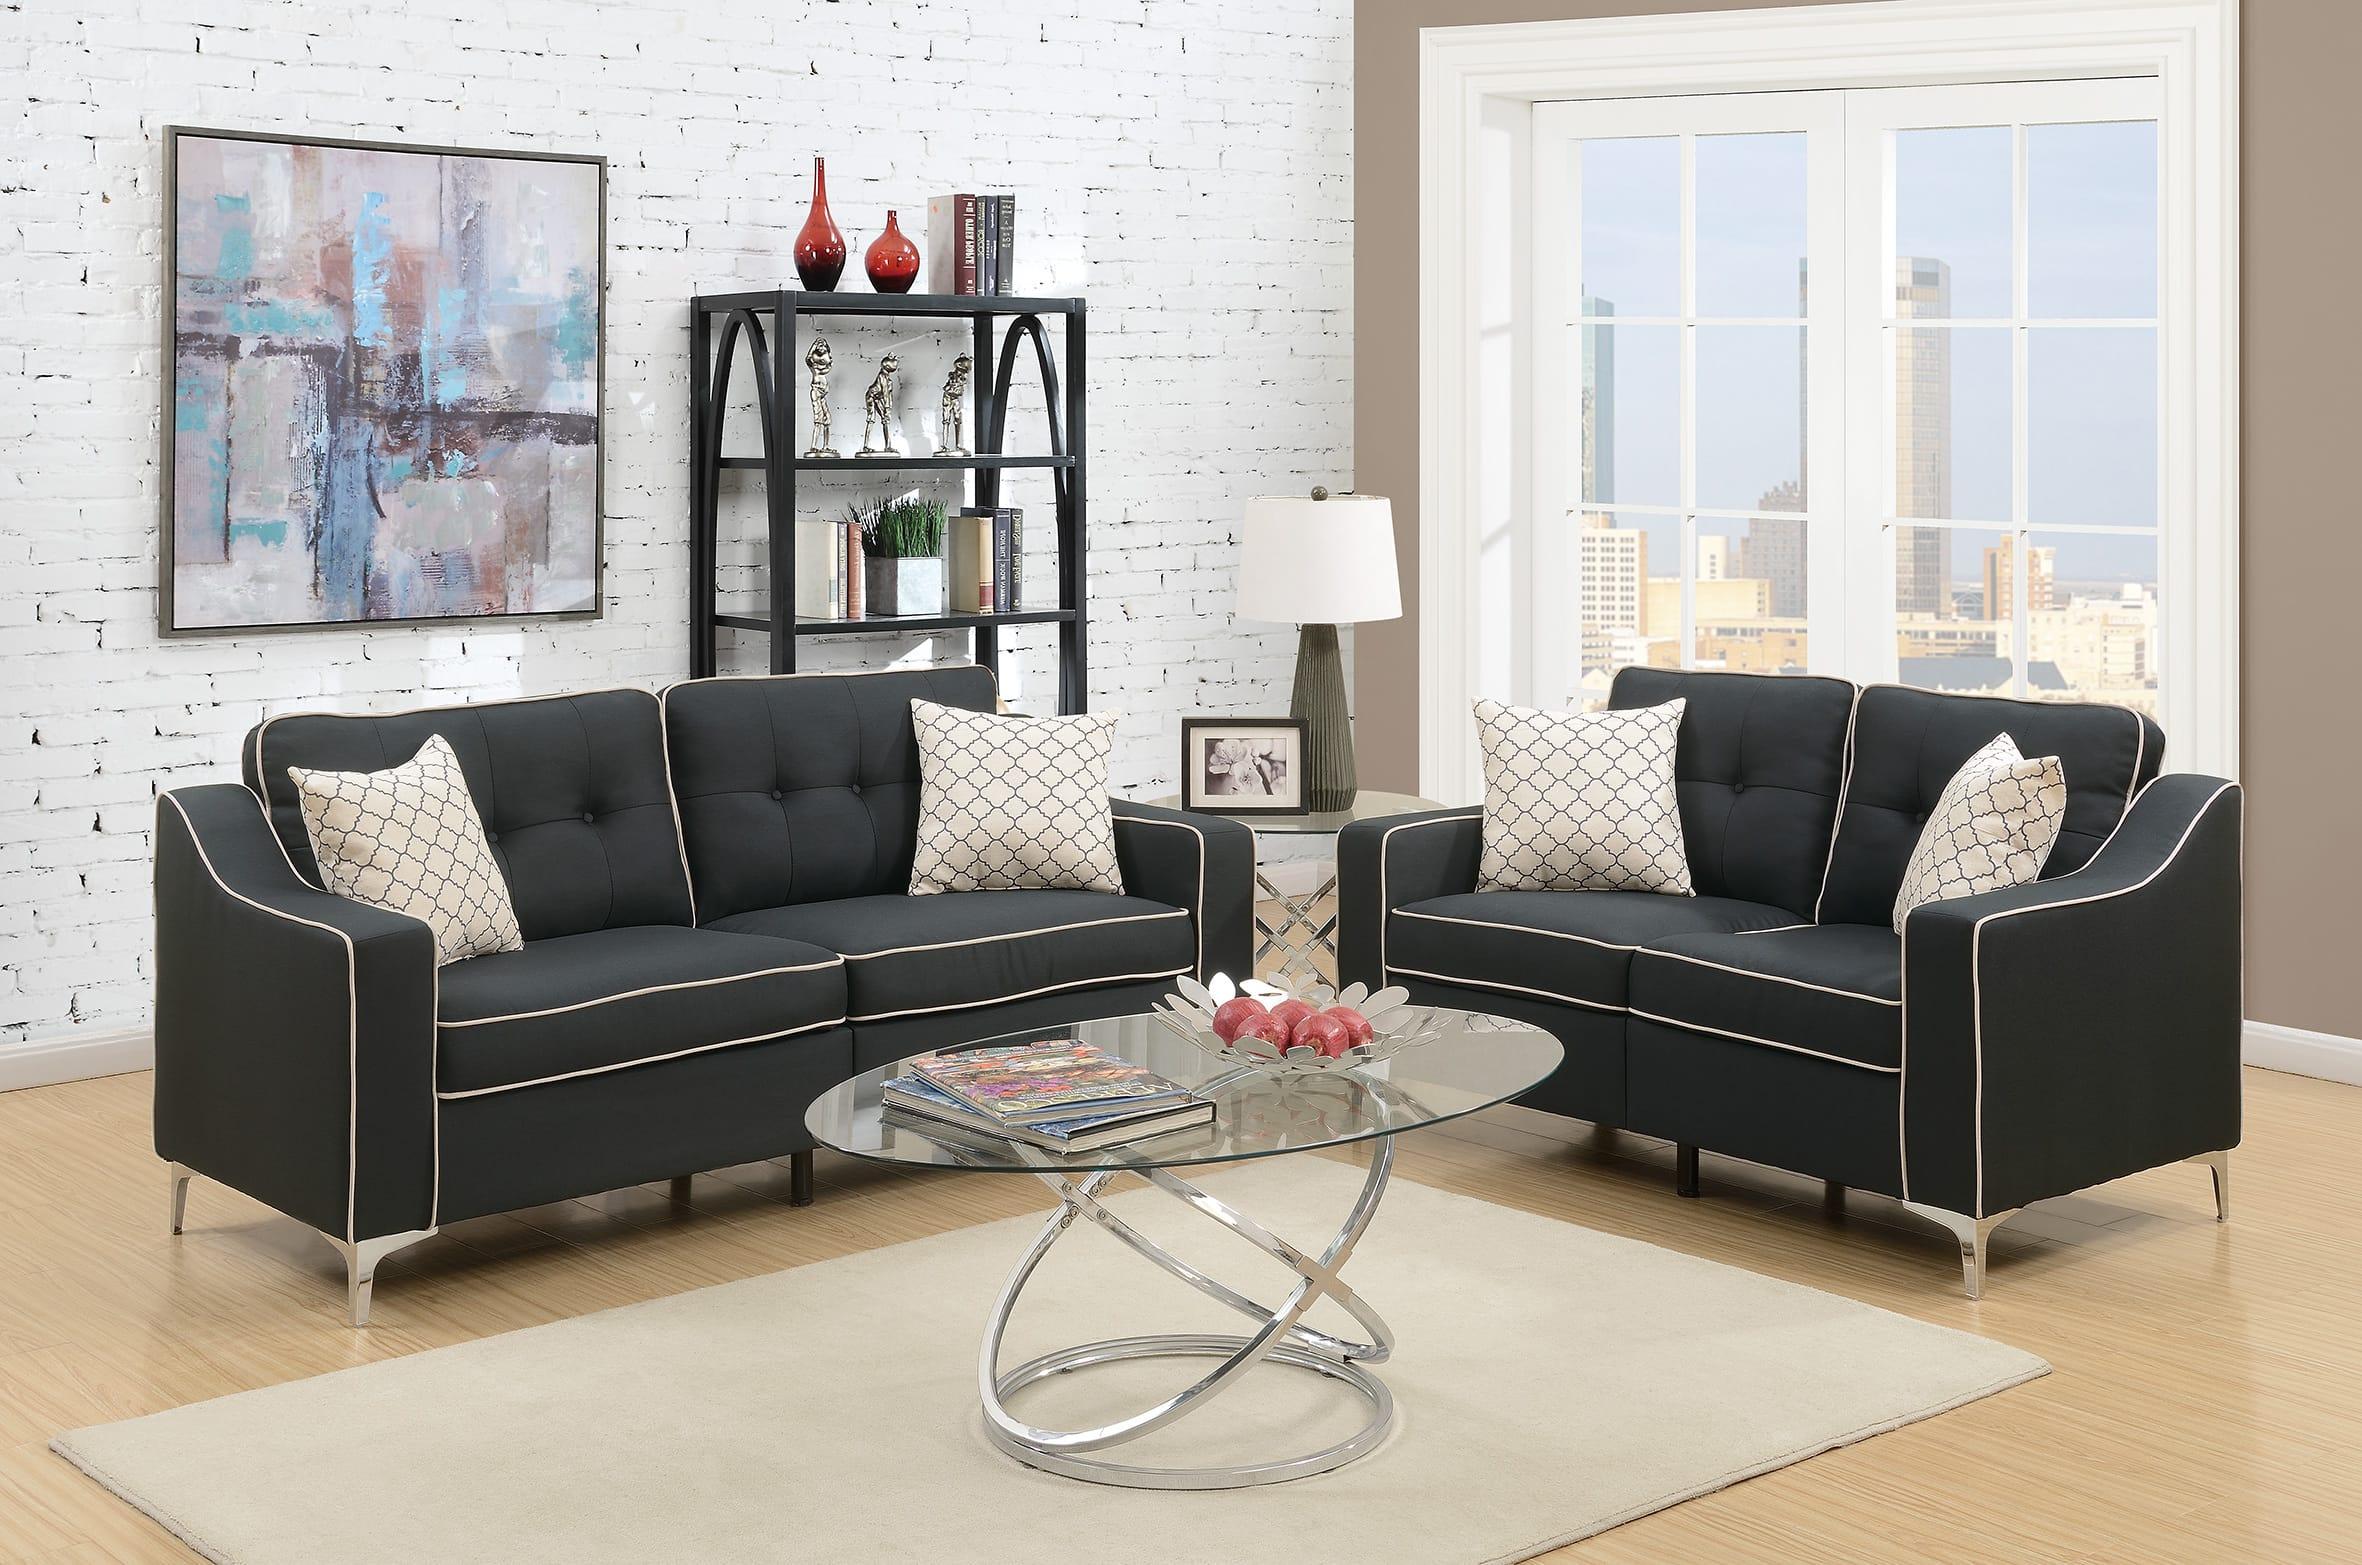 F6891 Black 2 Pcs Sofa Set by Poundex